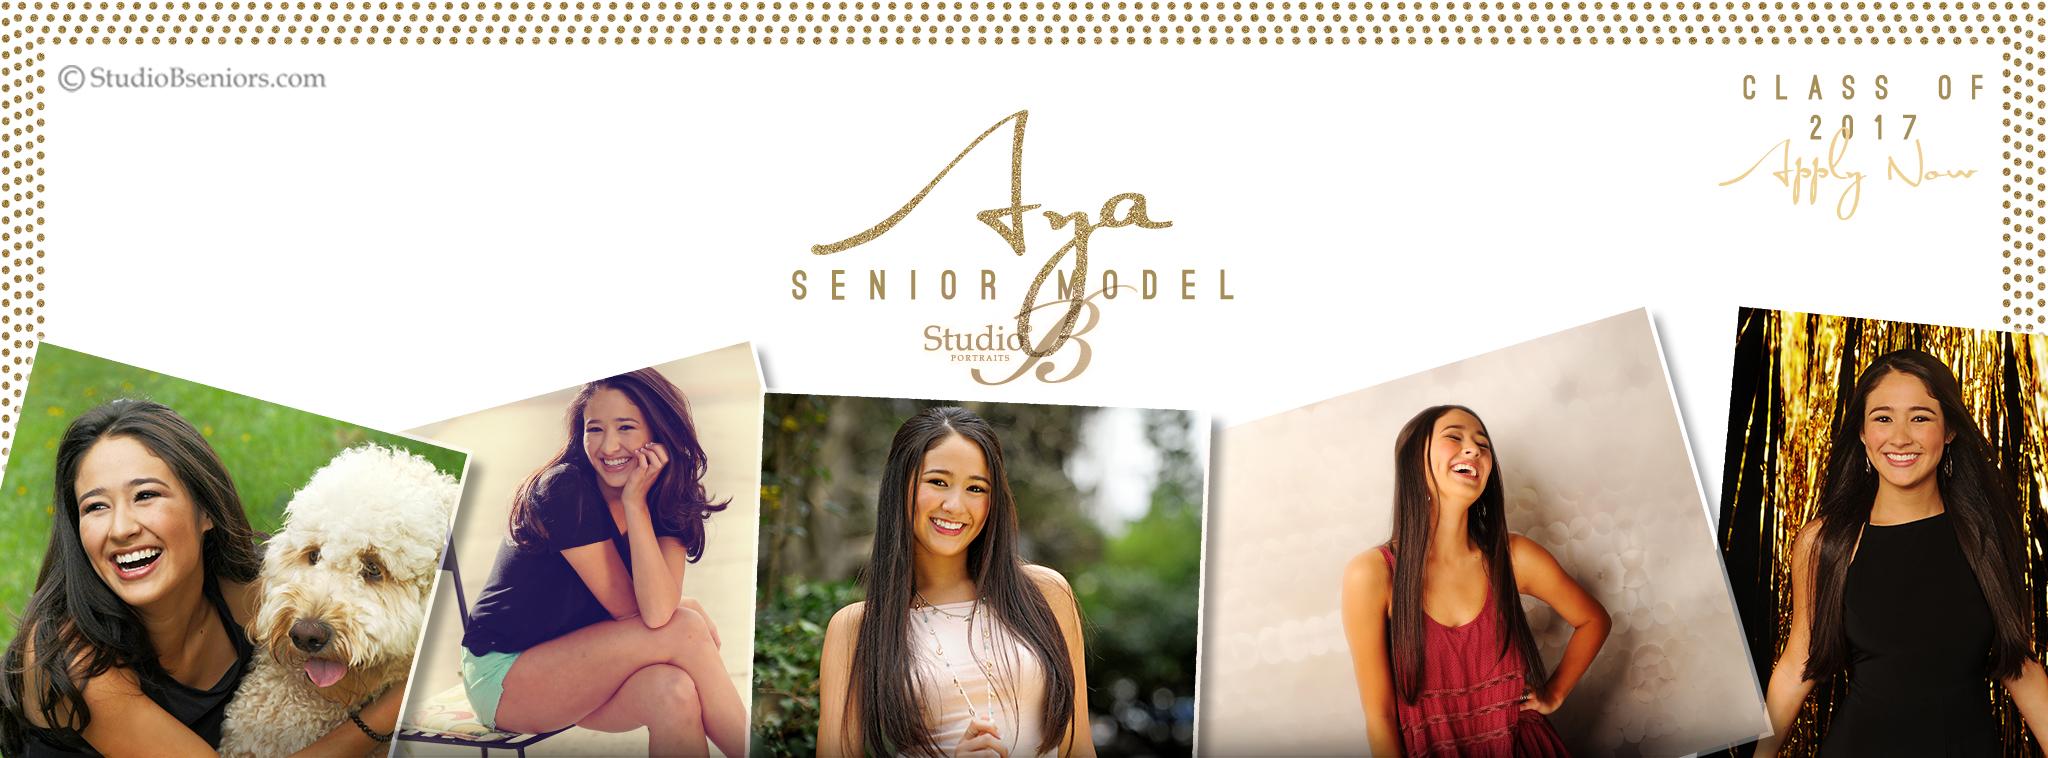 High School senior Model Facebook Cover_Aya